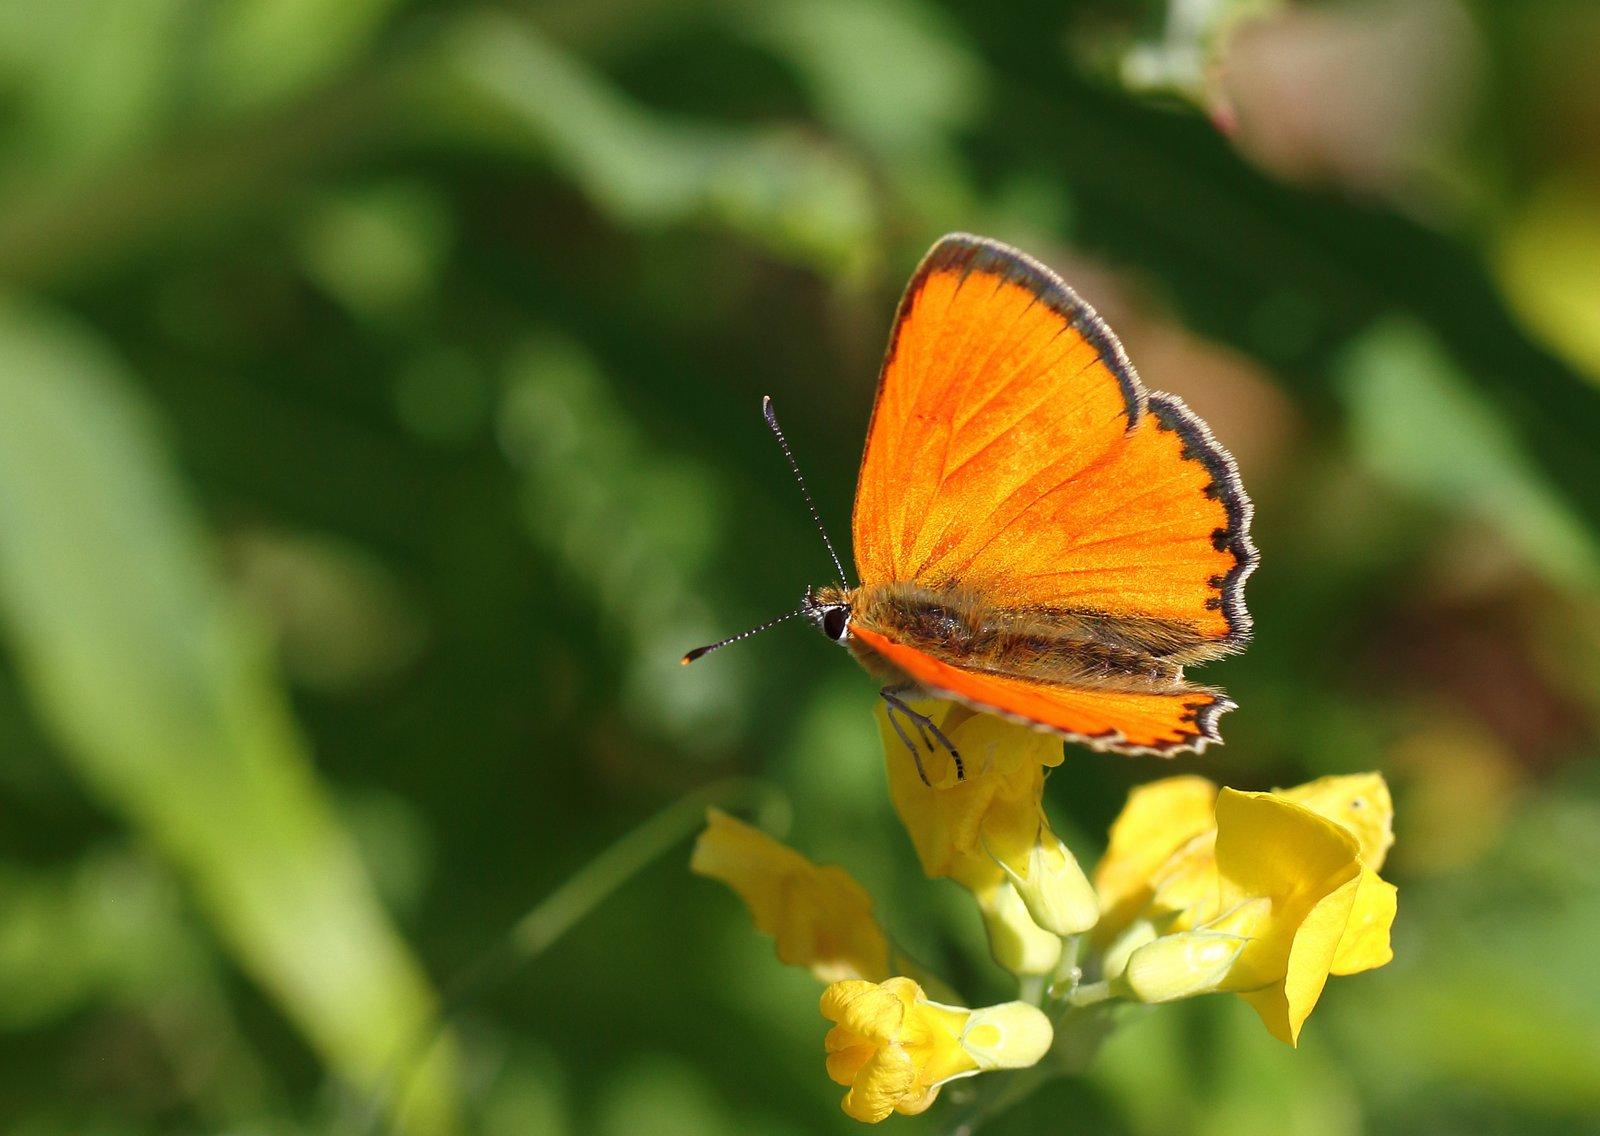 Dukatsommerfugl, Lycaena virgaureae